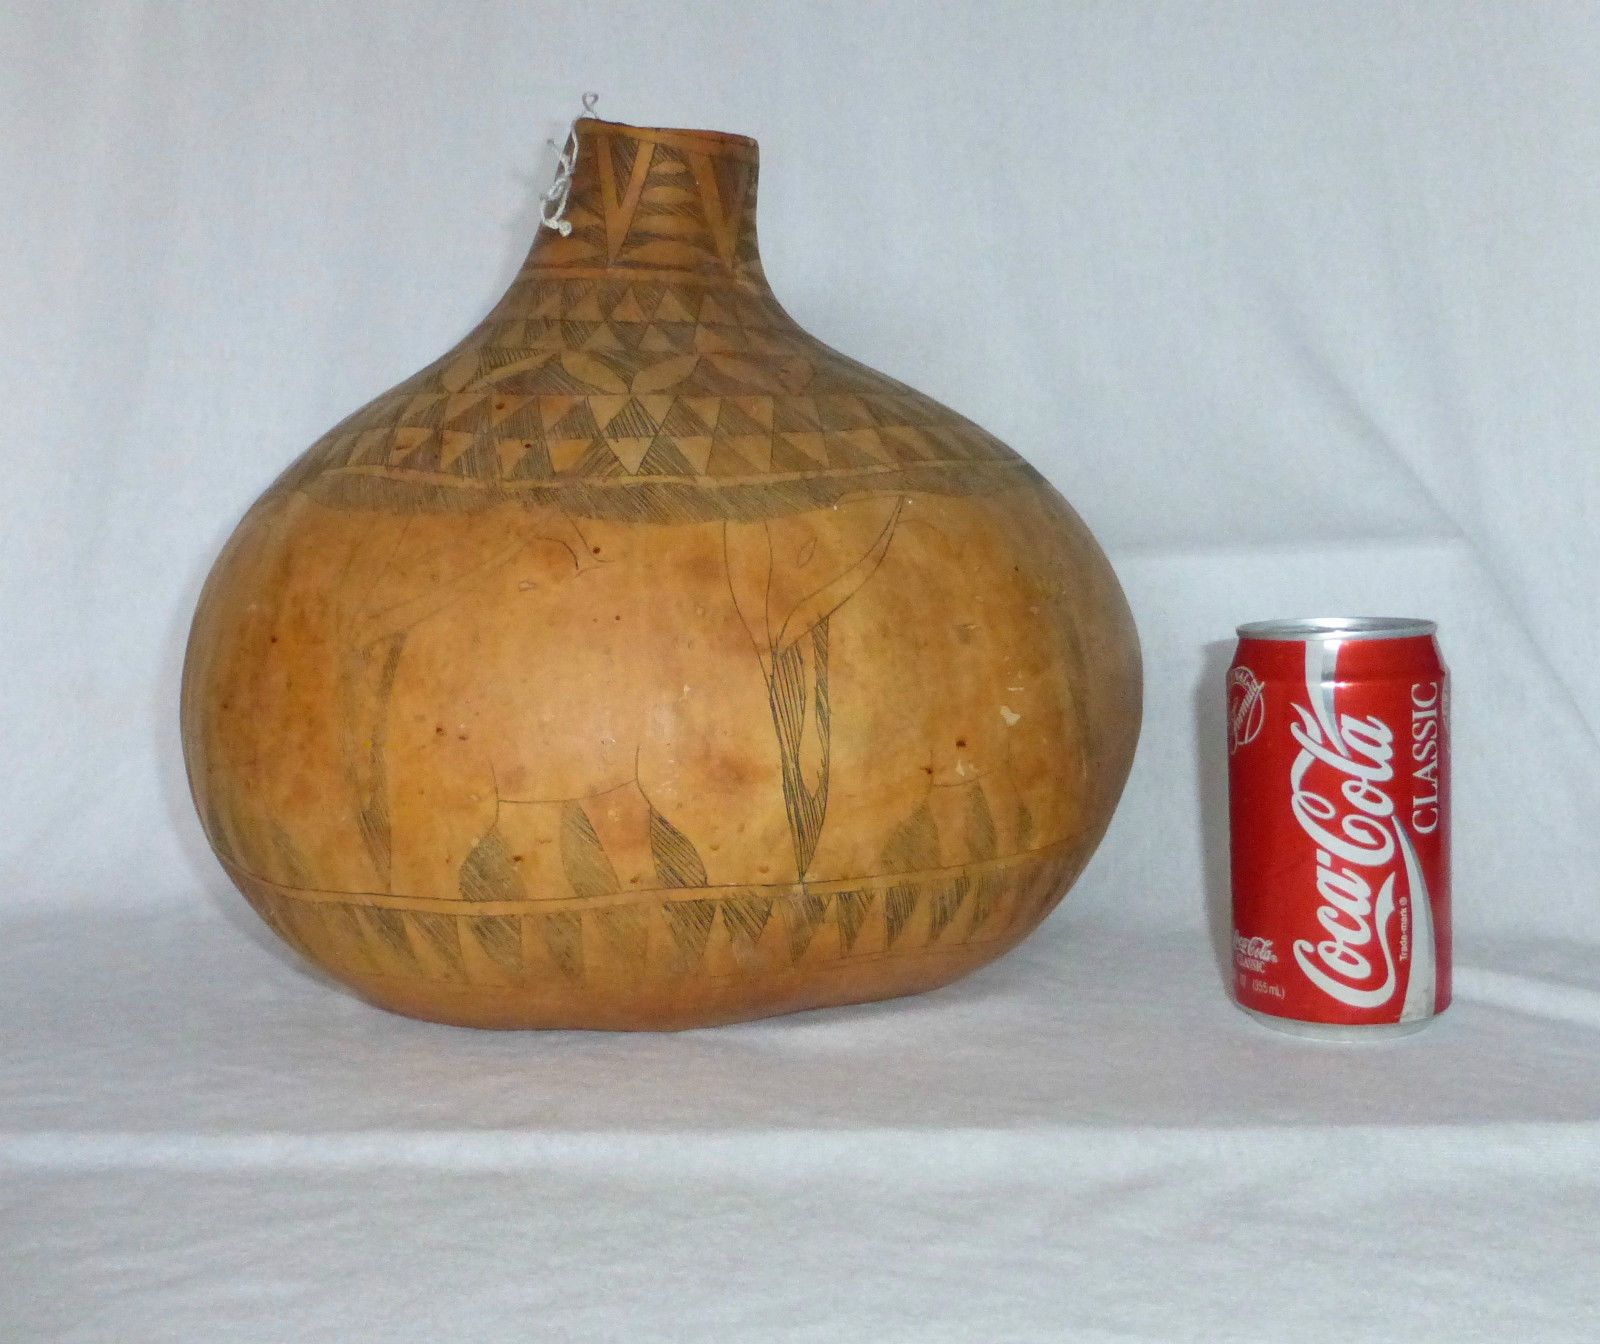 Details about Large Vintage African Etched Calabash Gourd